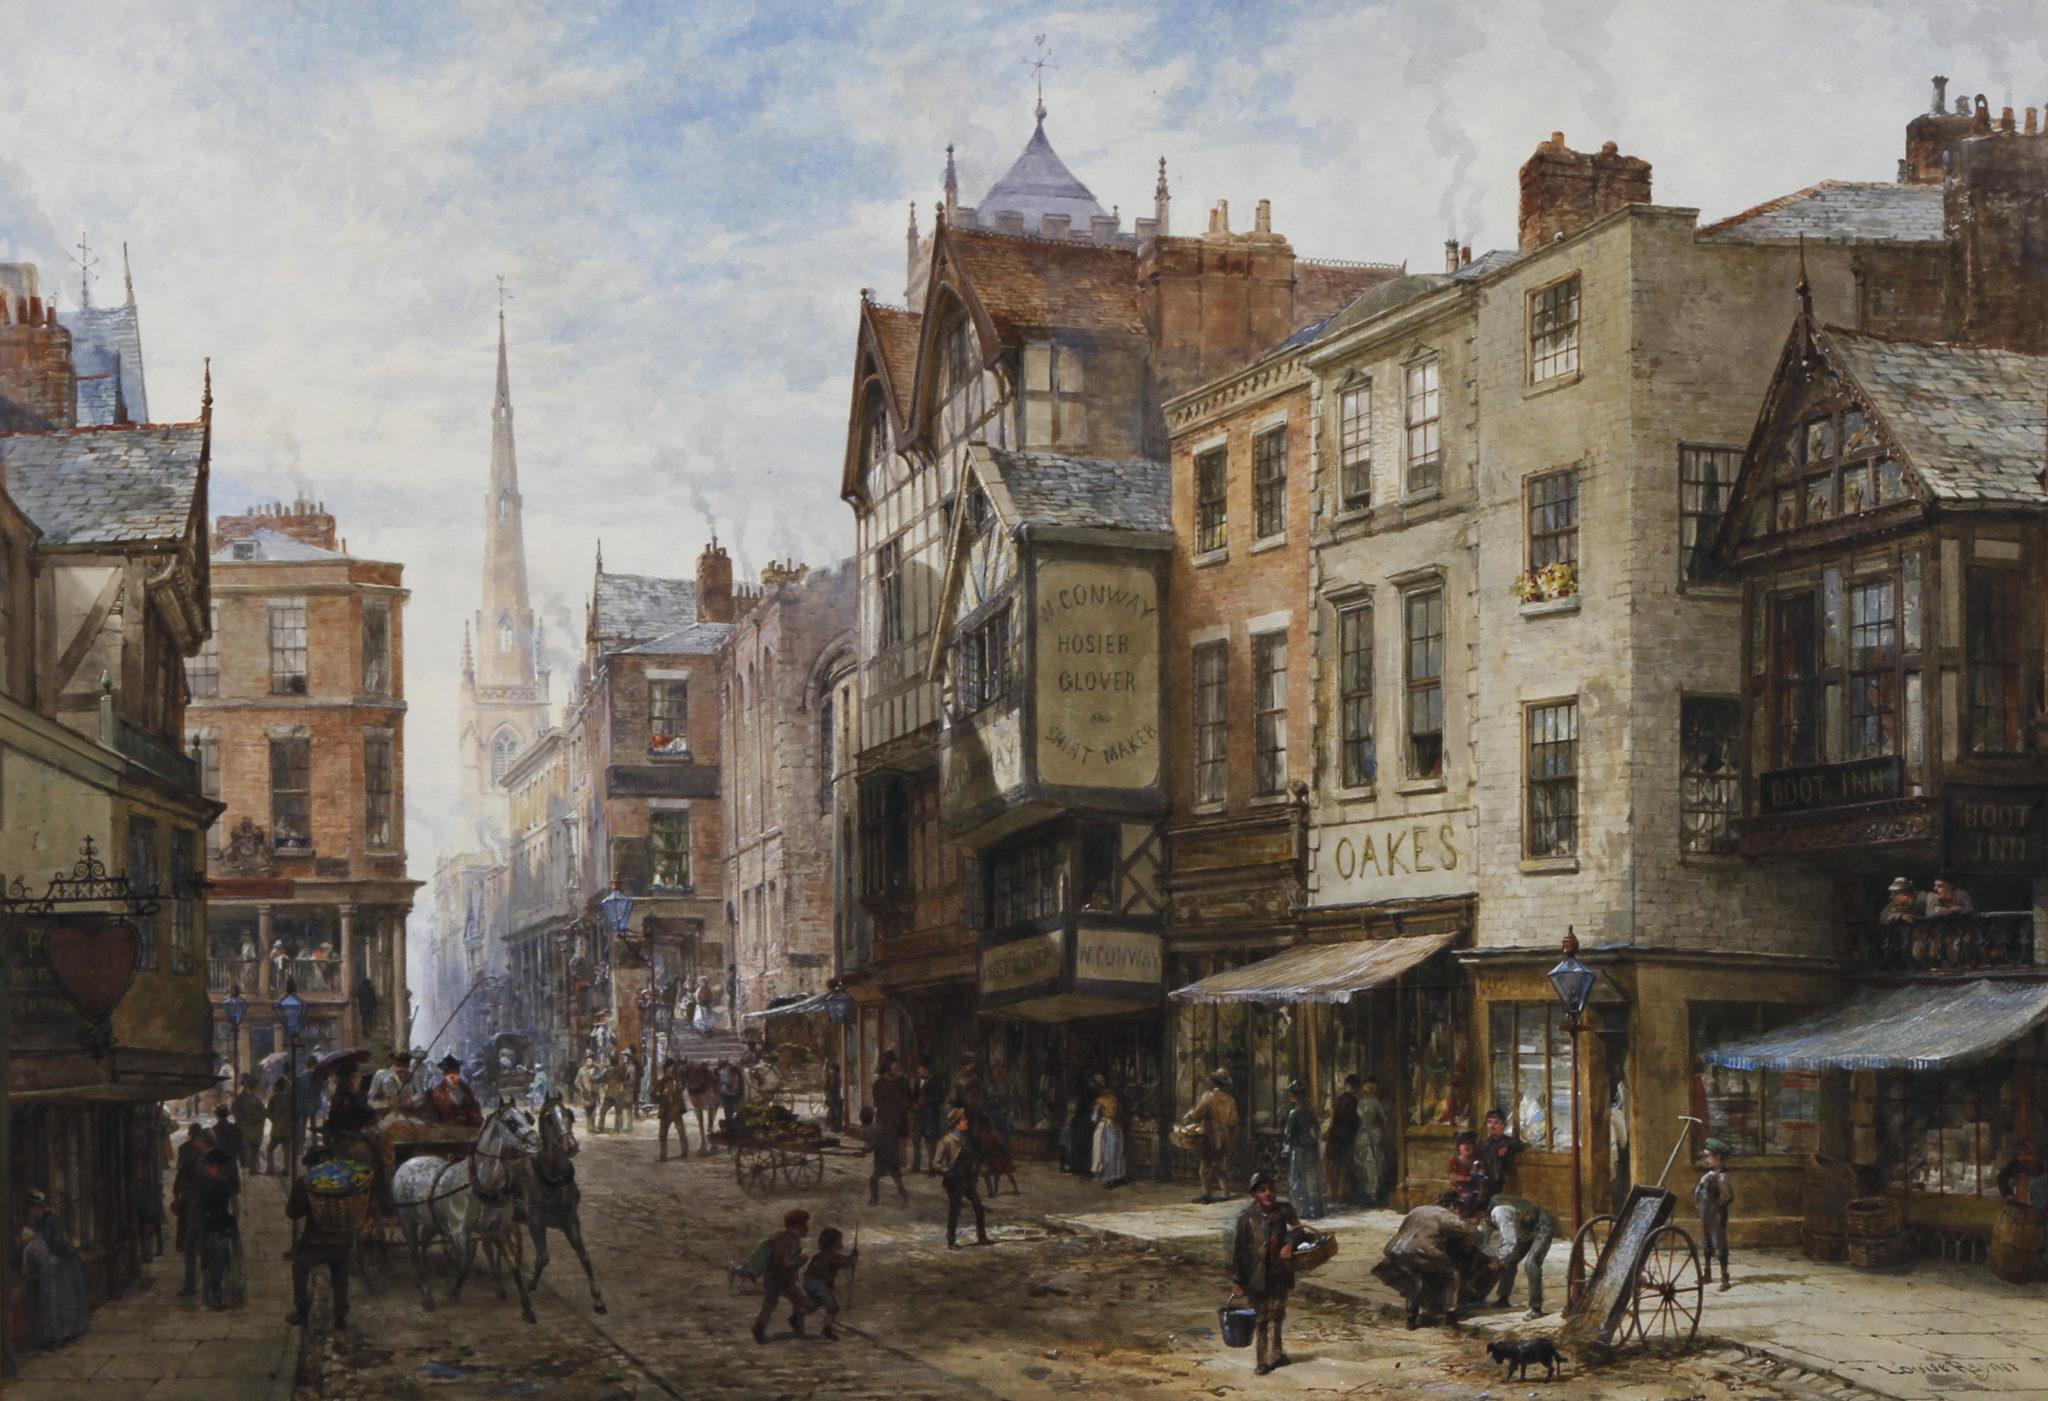 Pintura de Chester, Inglaterra por Louise Wayner. Foto: Wikipedia Commons.